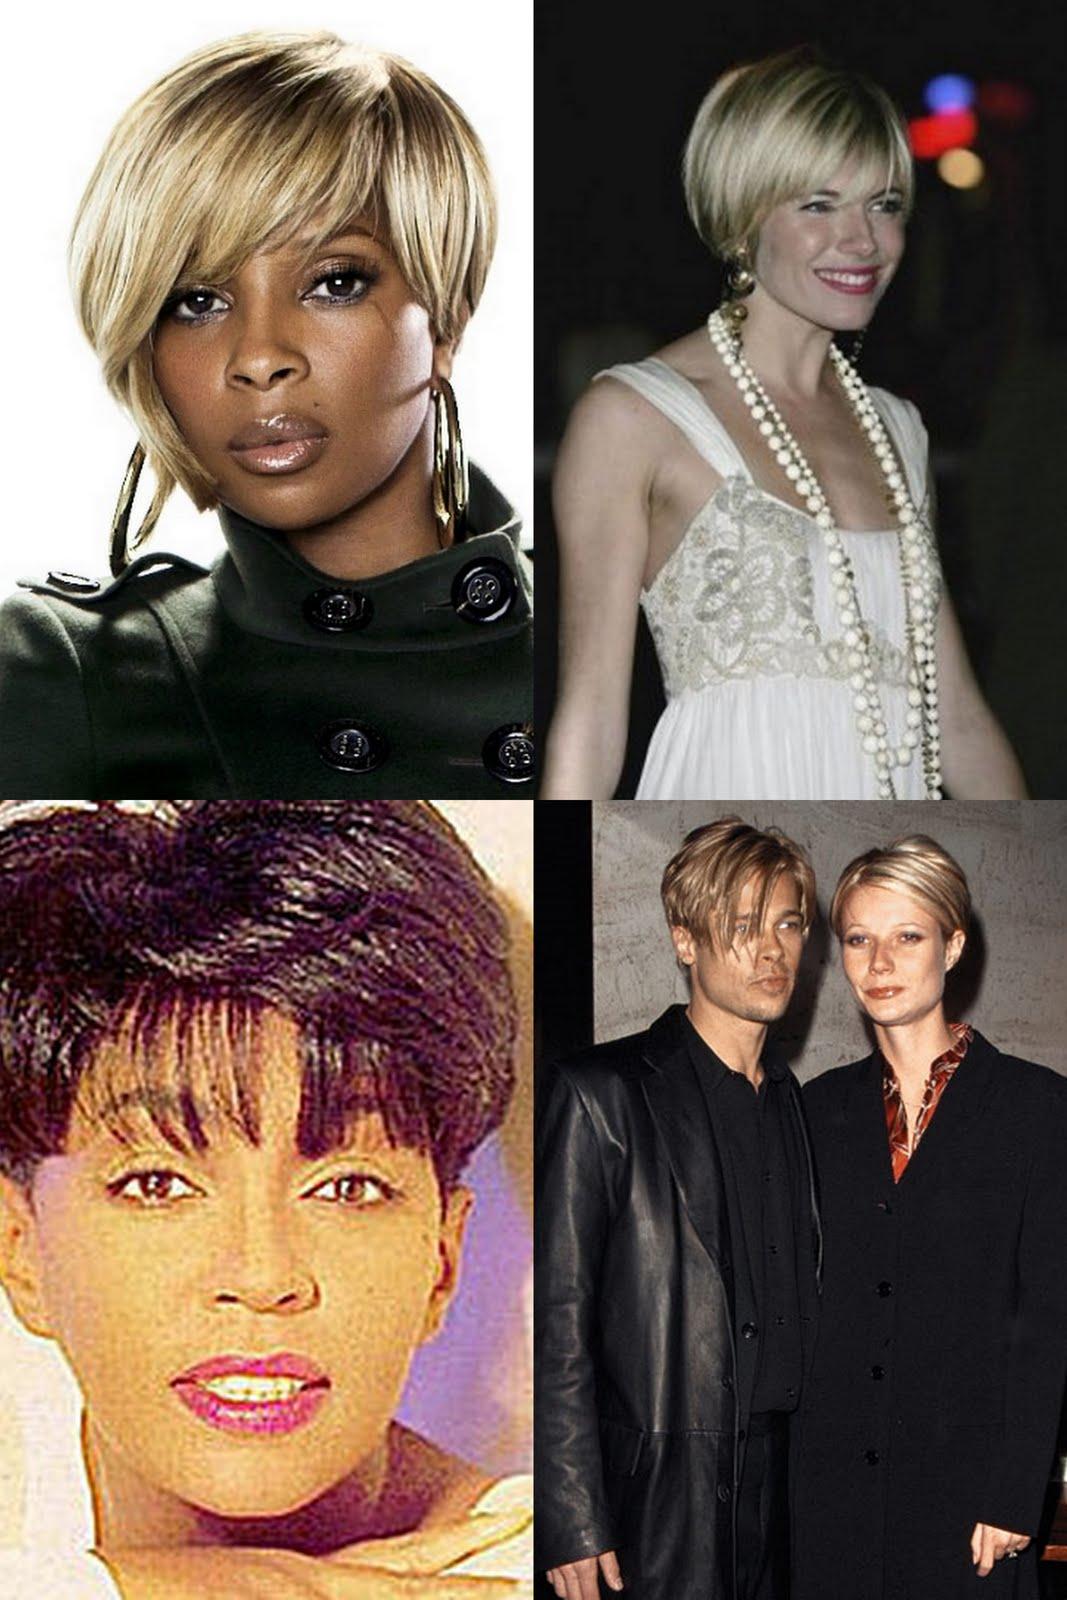 Anita Baker Hairstyles and Cut